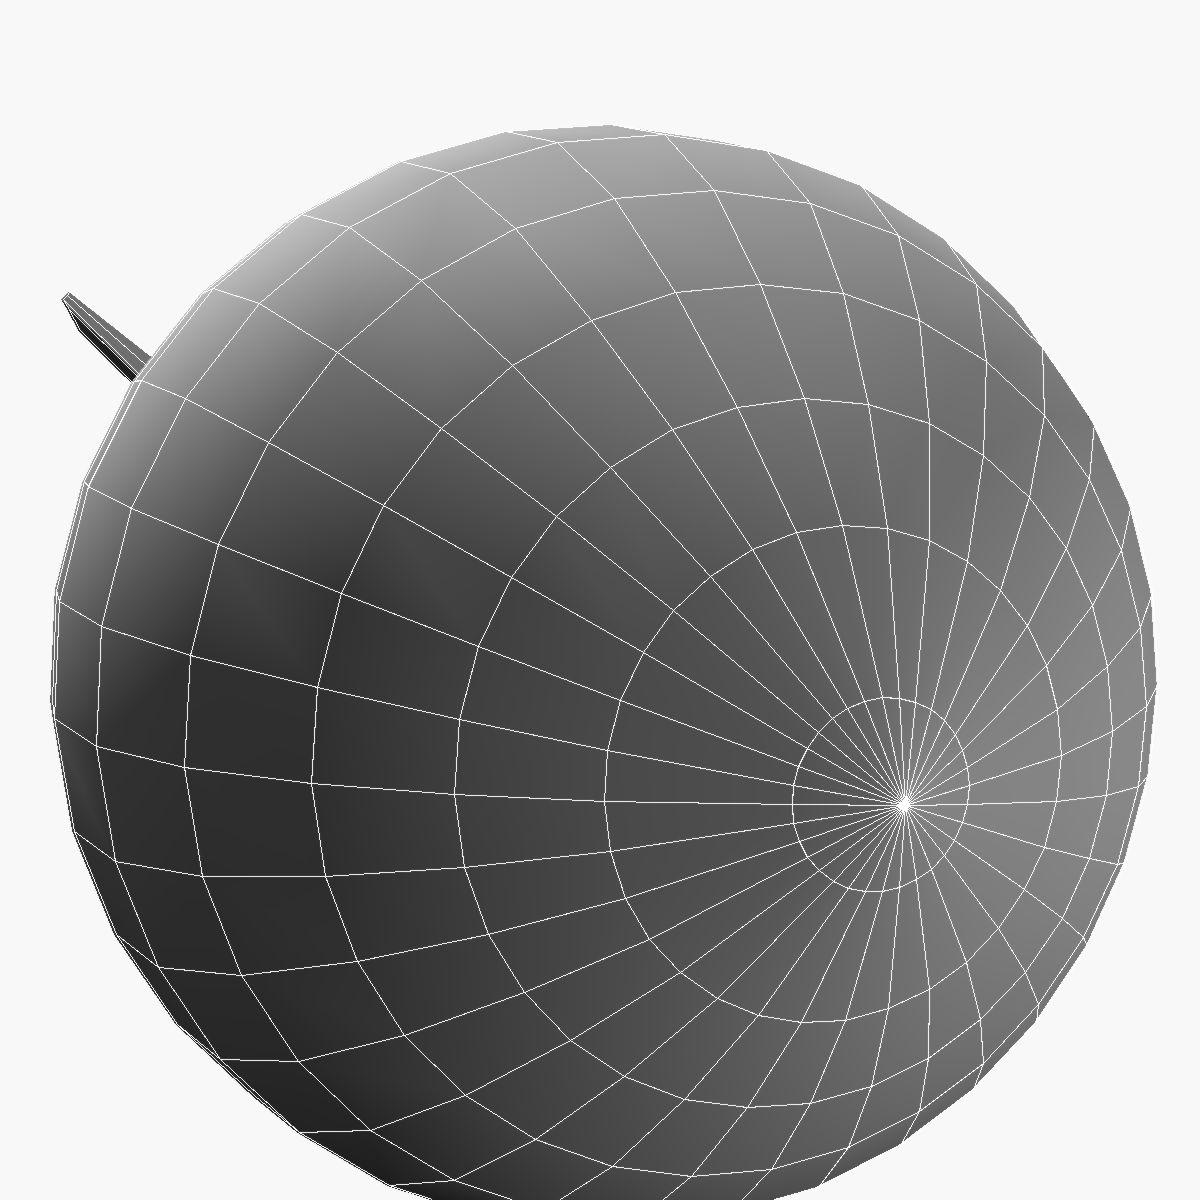 Bomb, Jolly Roger scheme 3d model 3ds dxf fbx blend cob dae X obj 162680